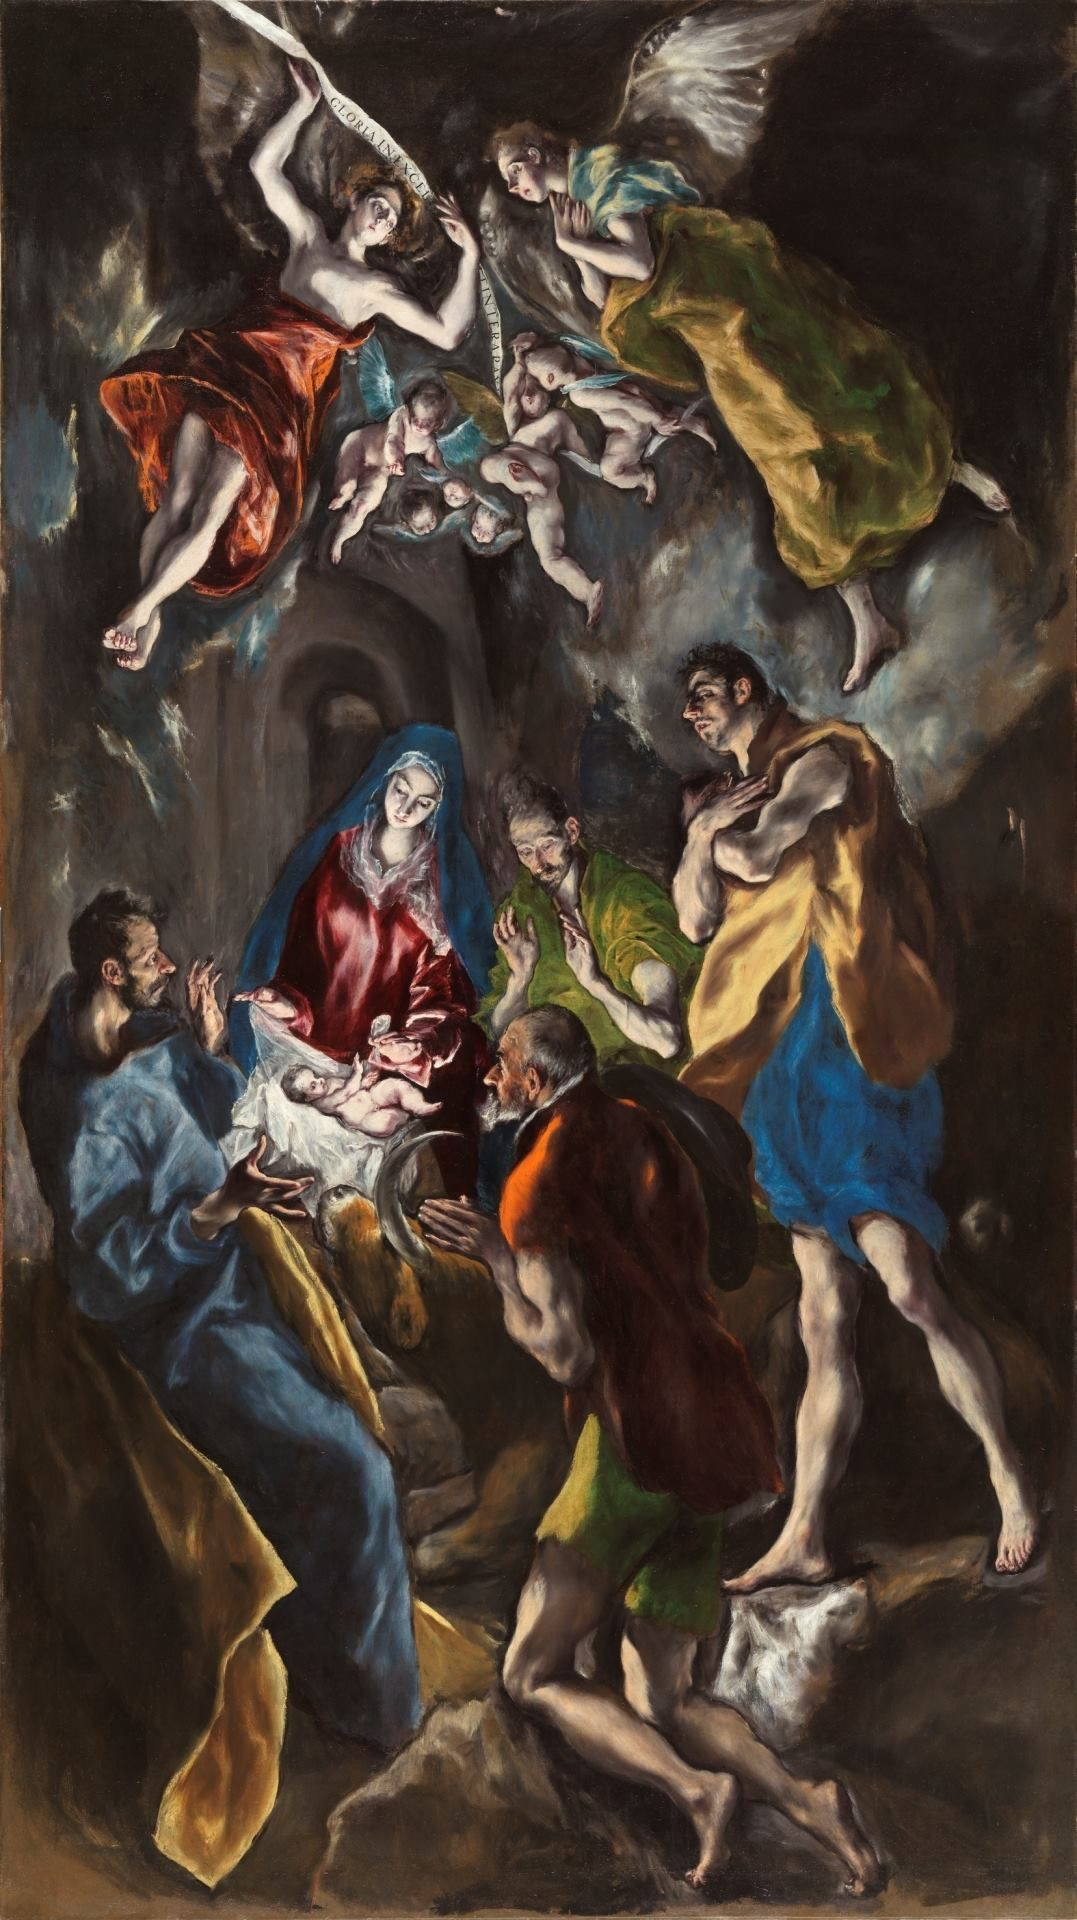 """Adoration of the shepherds"", El Greco, h. 1612-1614."